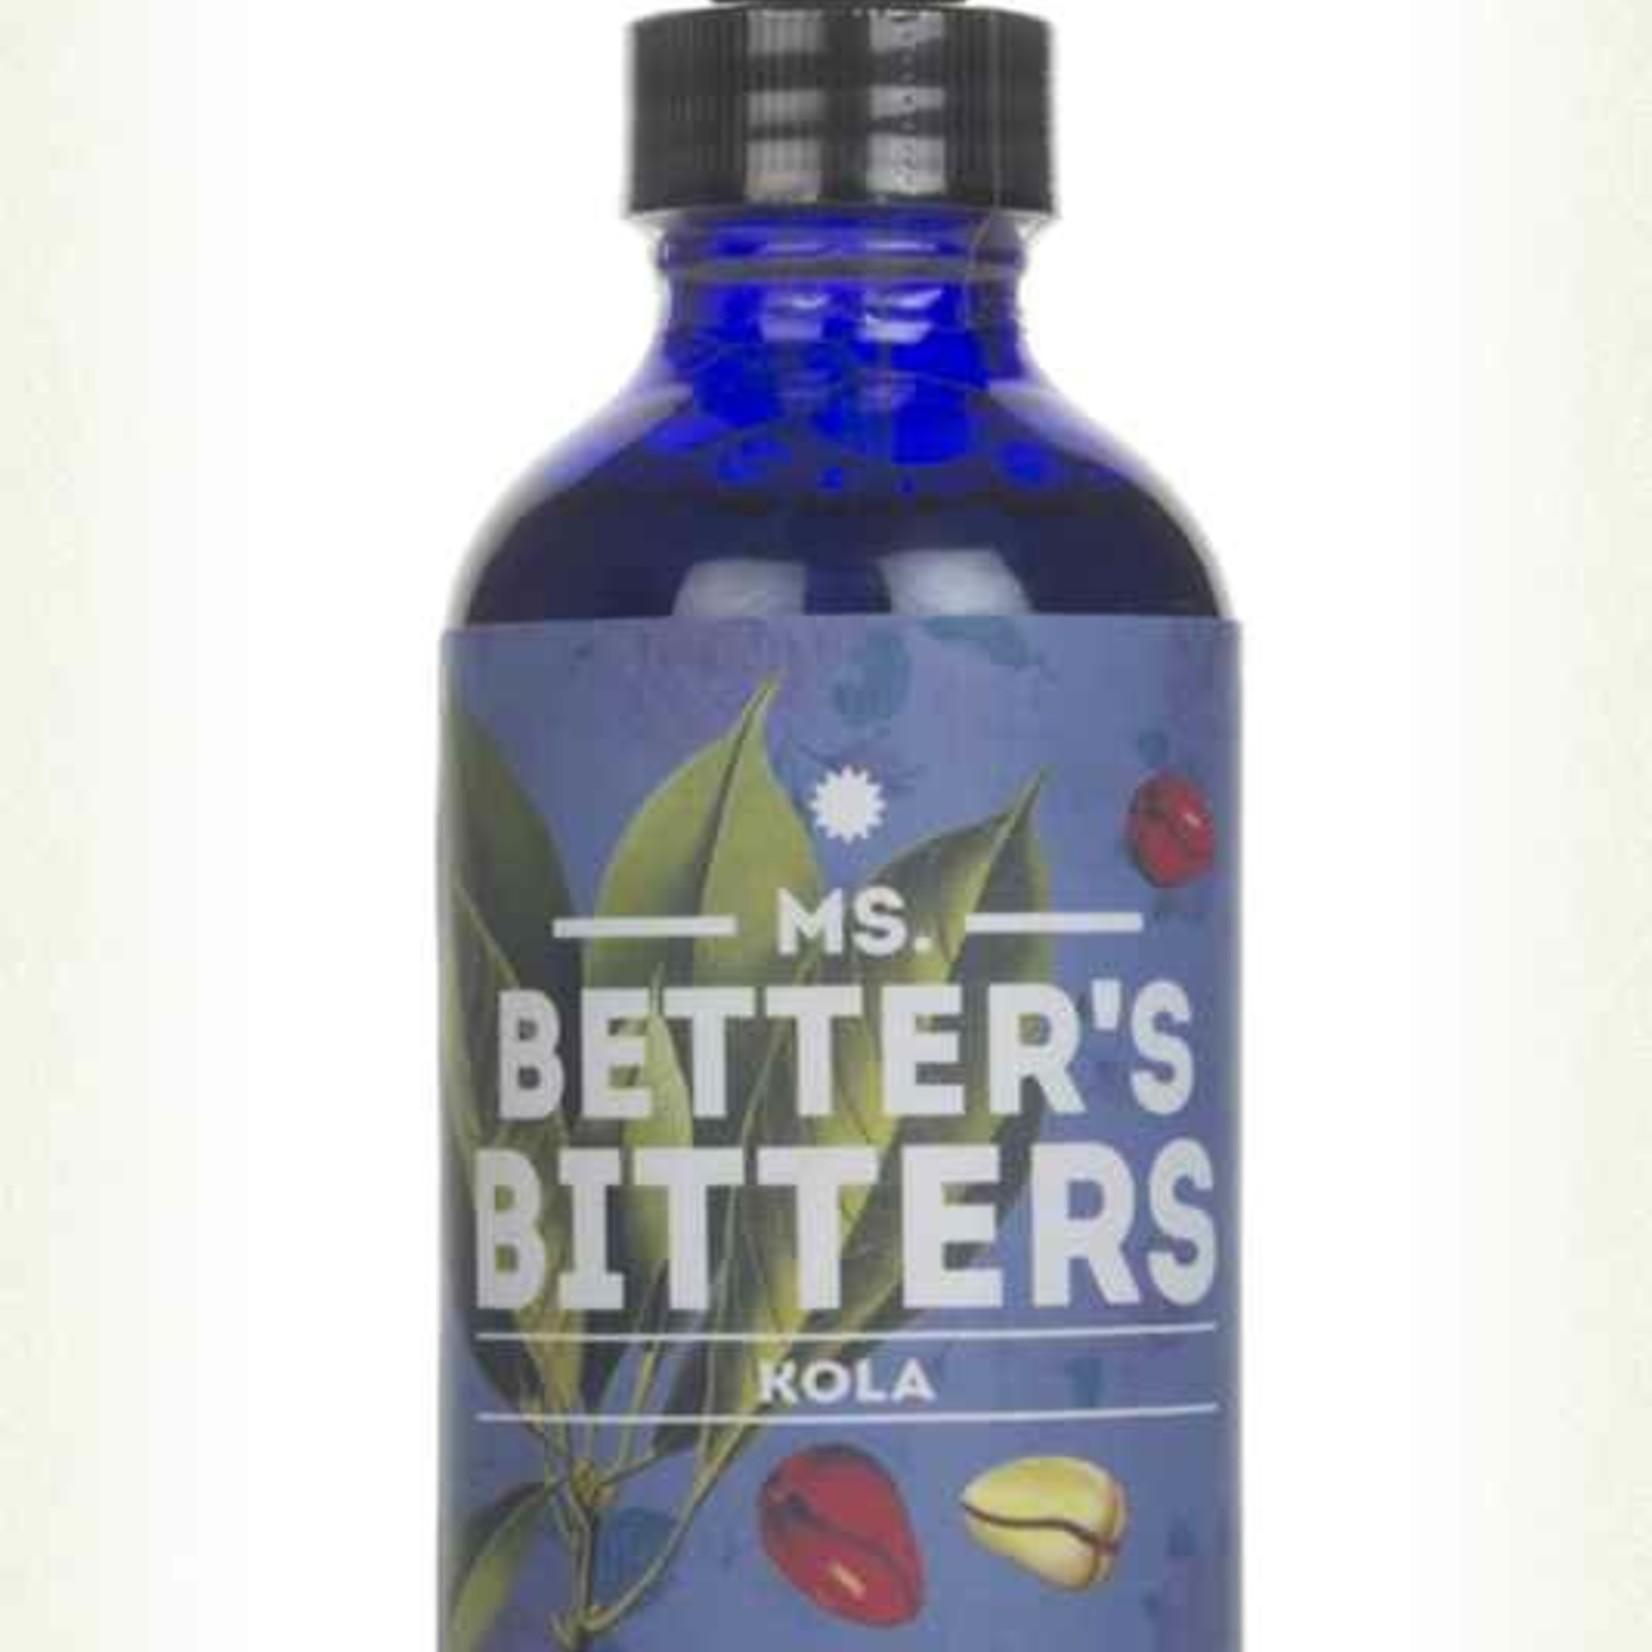 Ms Better's Bitters Ms Better's Bitters Kola